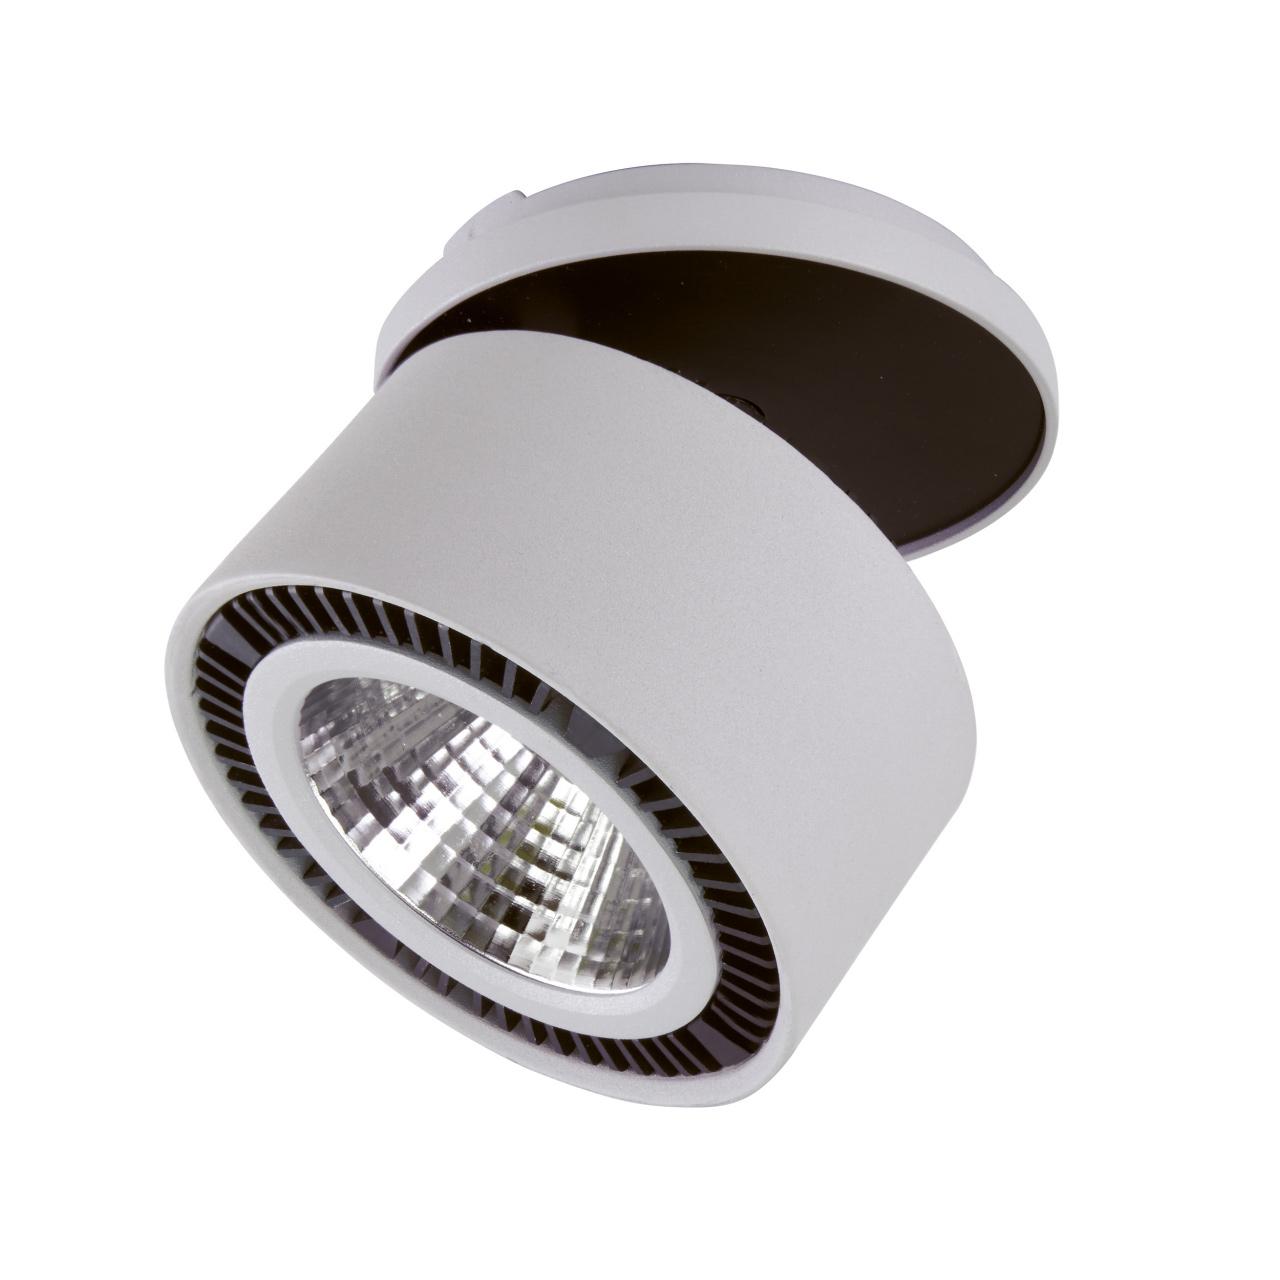 Светильник Forte inca LED 40W 3400LM 30G серый 3000K Lightstar 213849